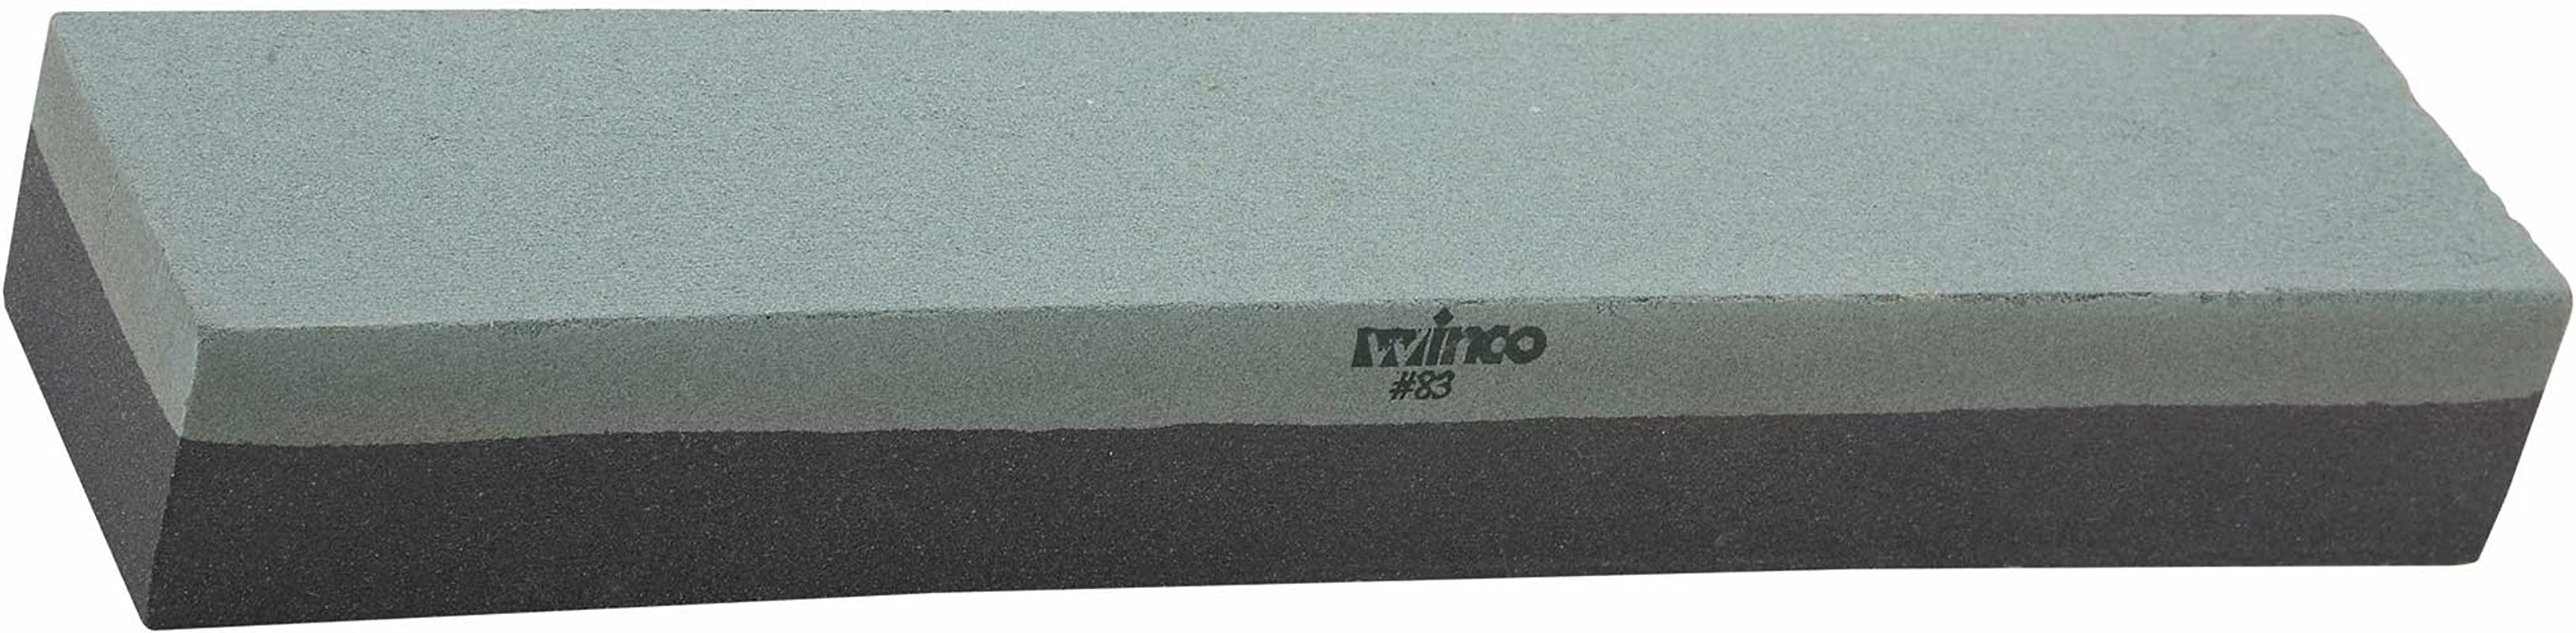 Winco SS 1211 Fine Grain Knife Sharpening Stone 12 Inch Medium